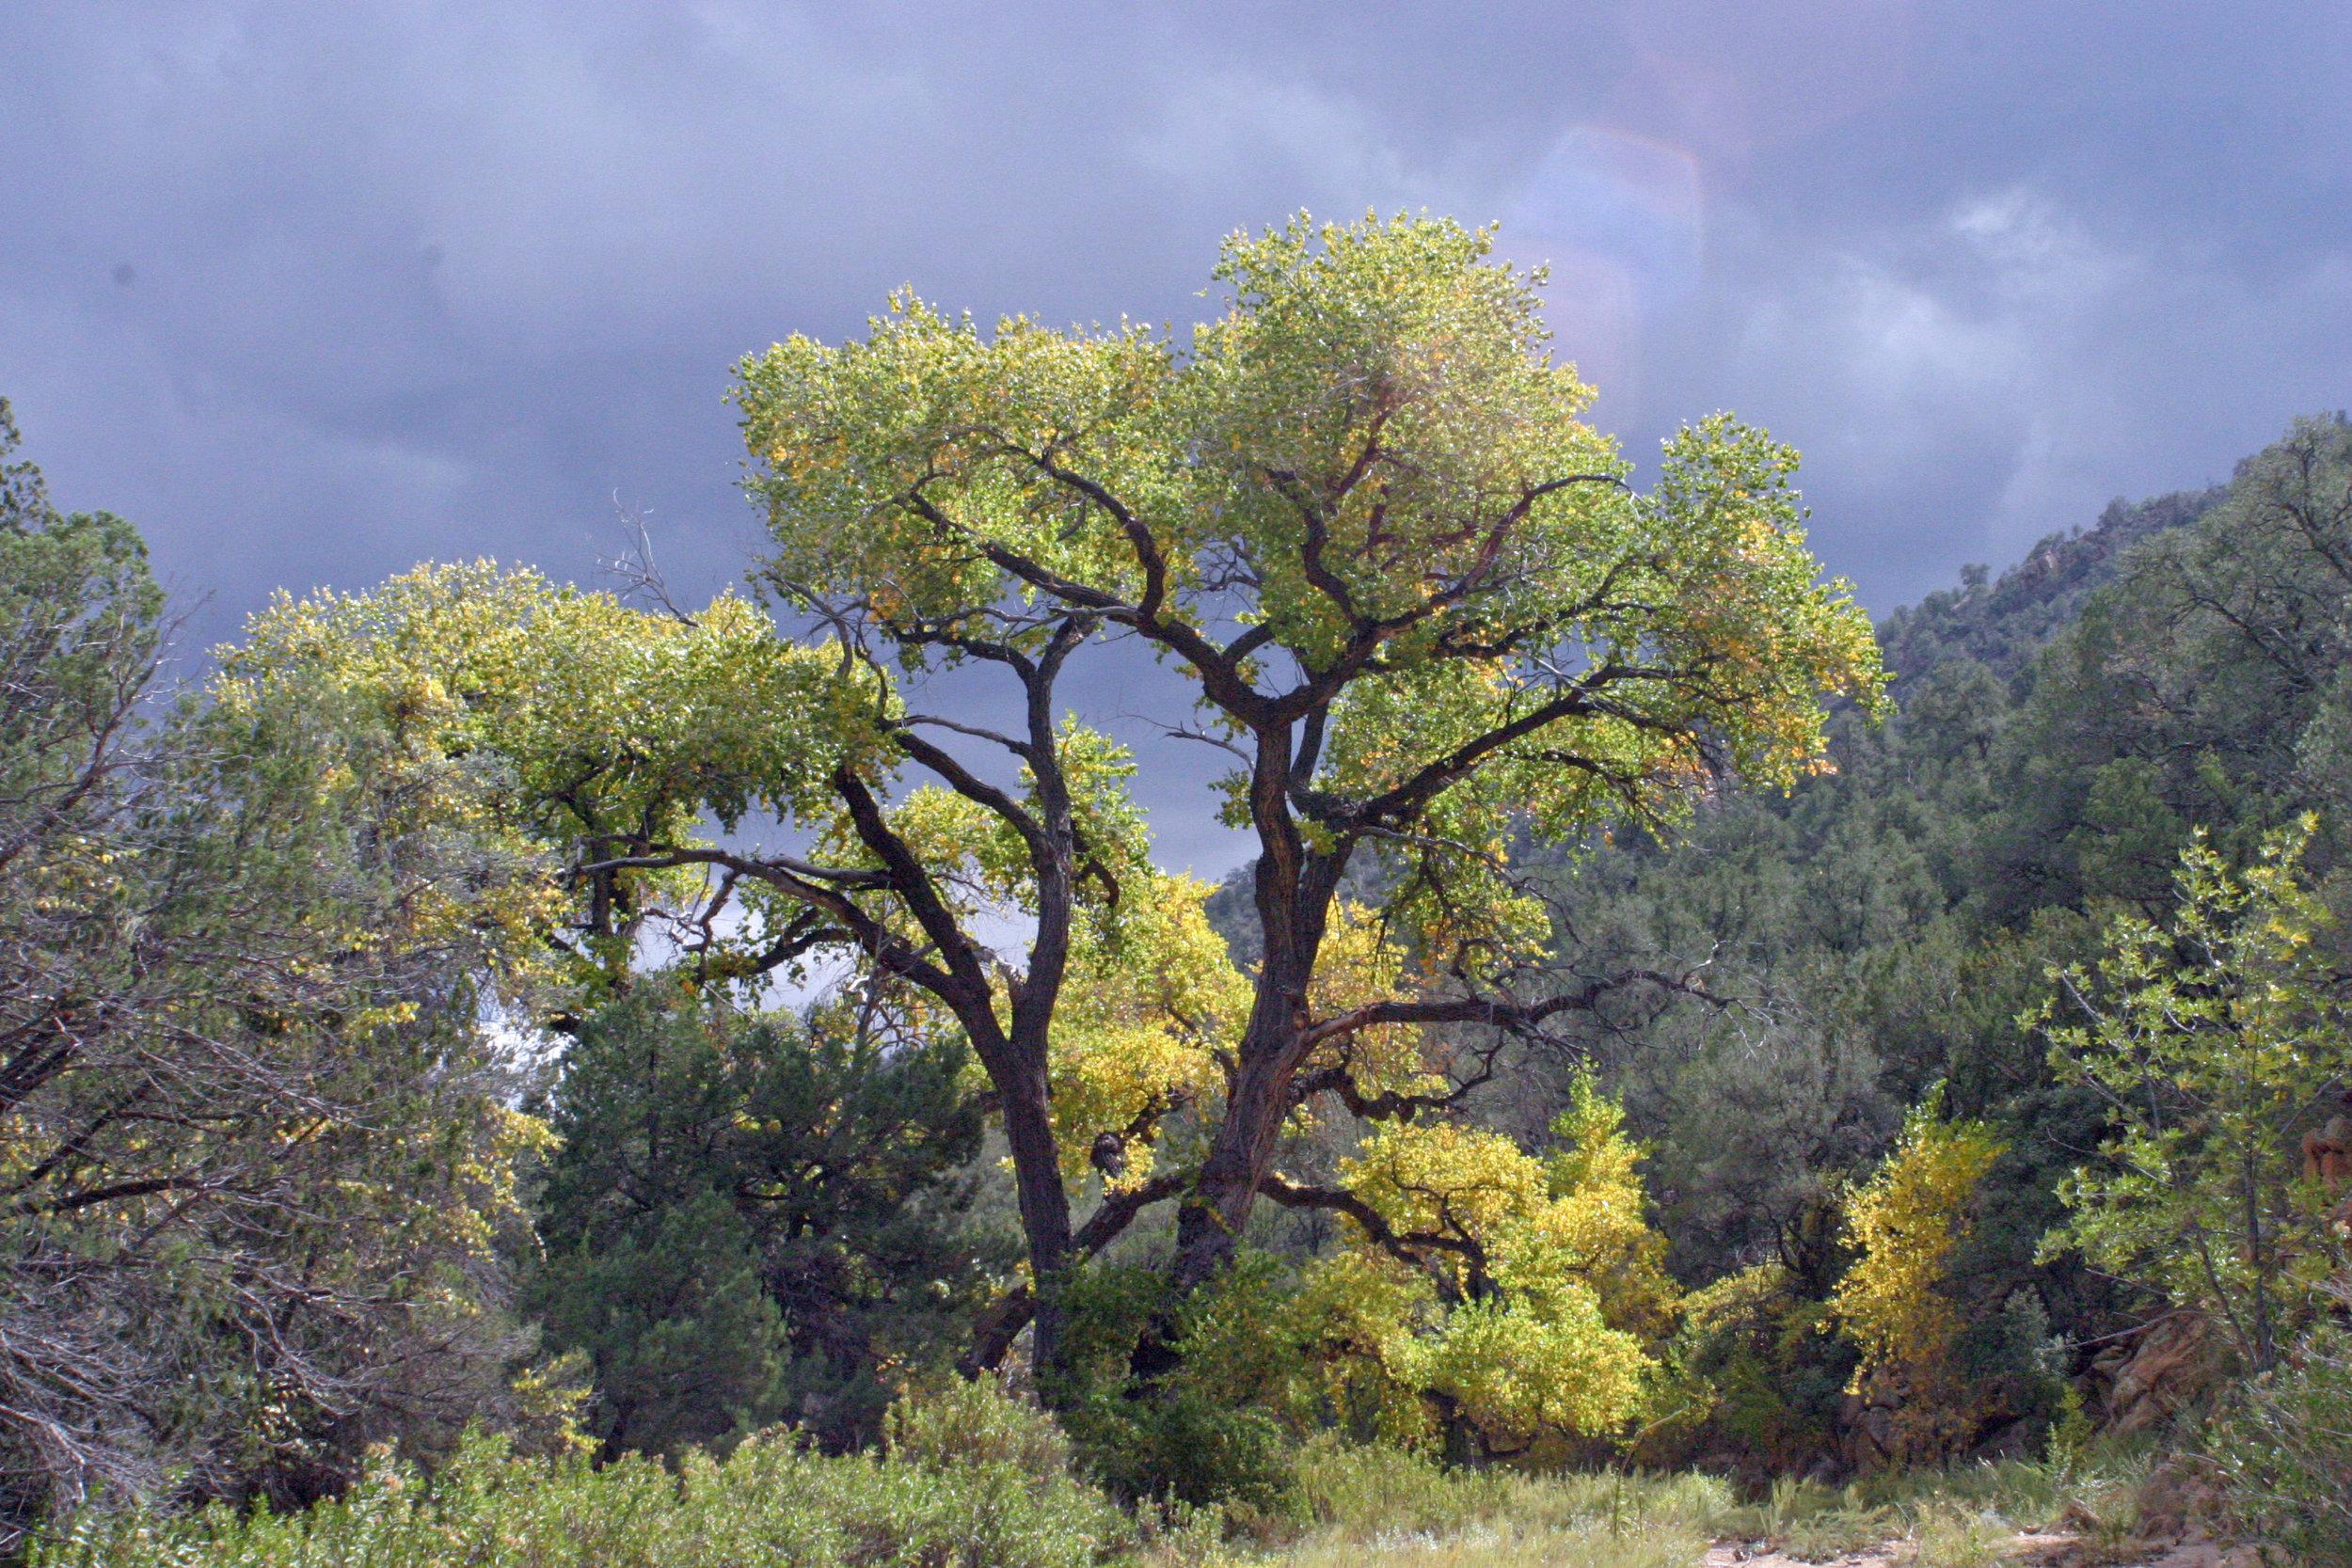 Populus fremontii subsp. fremontii, photo Russ Kleinman, Burro Mtns., CF Canyon, May 2, 2007